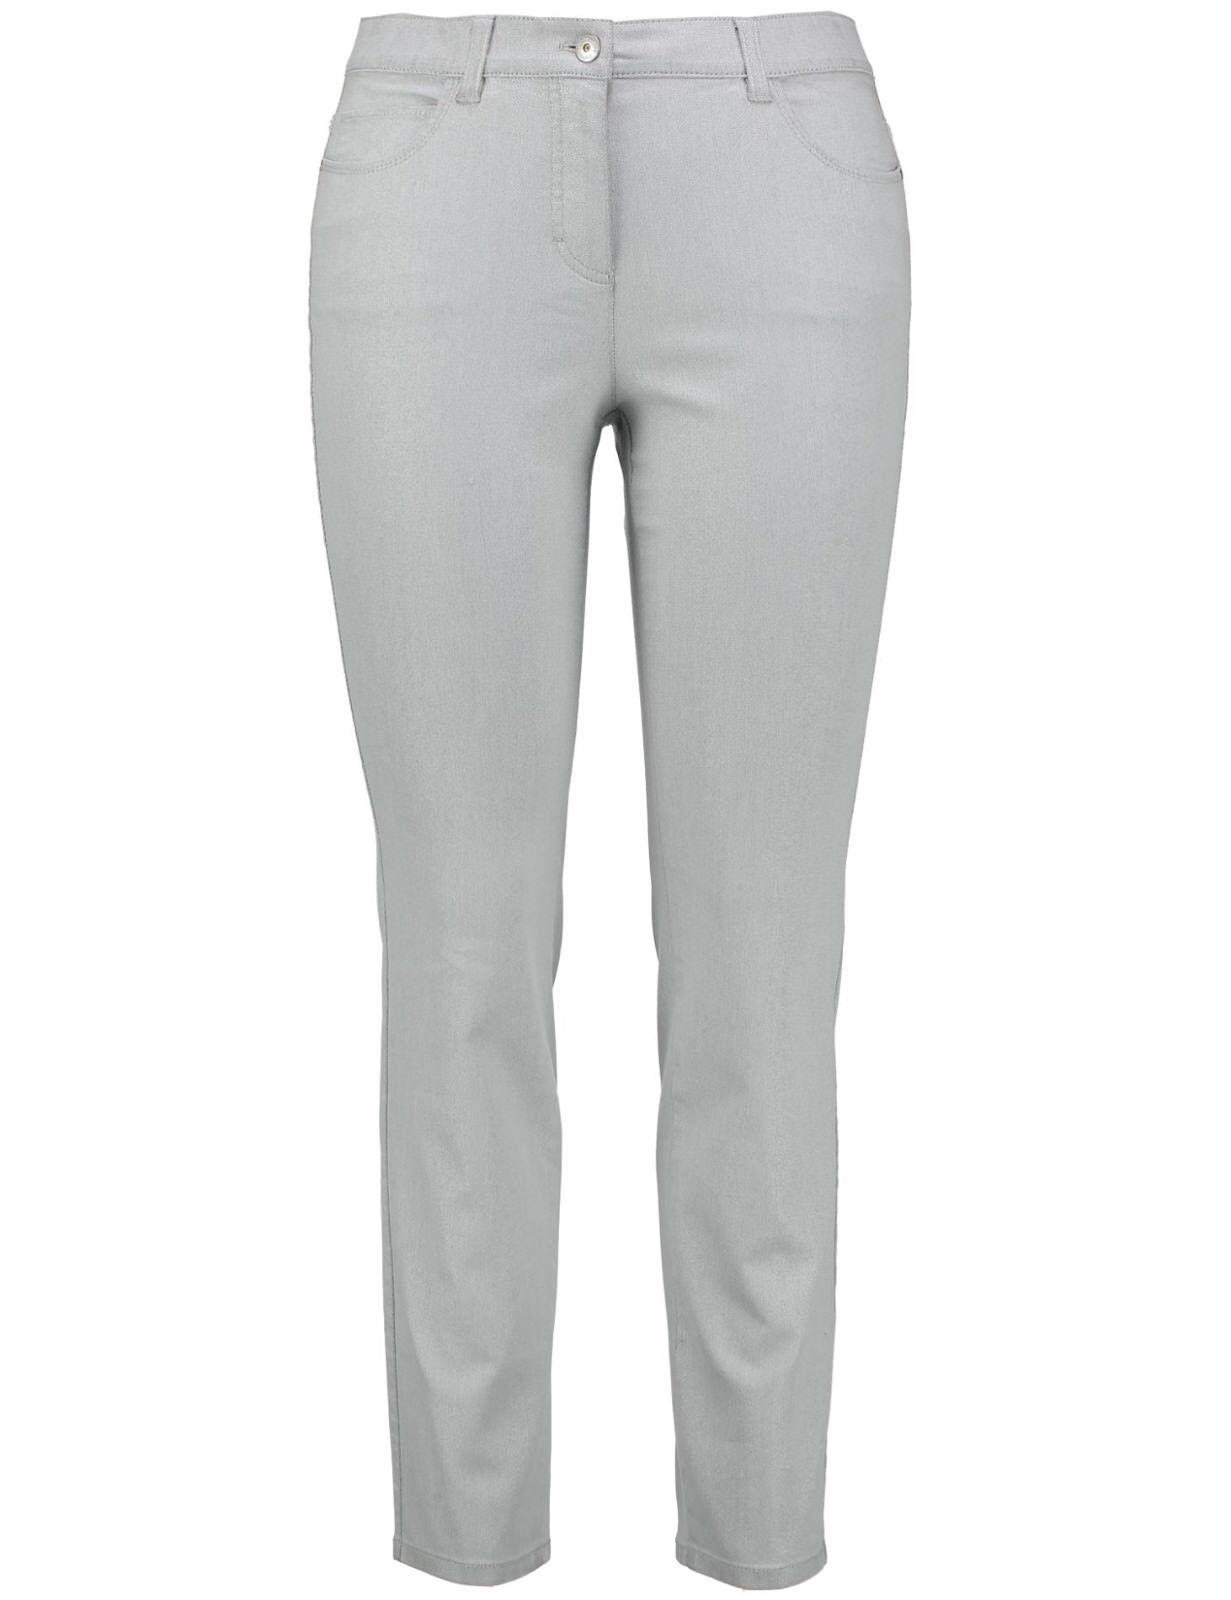 Samoon Jeans Hose by Gerry Weber silbrig-grau schimmernd Stretch Neu Damen Gr.